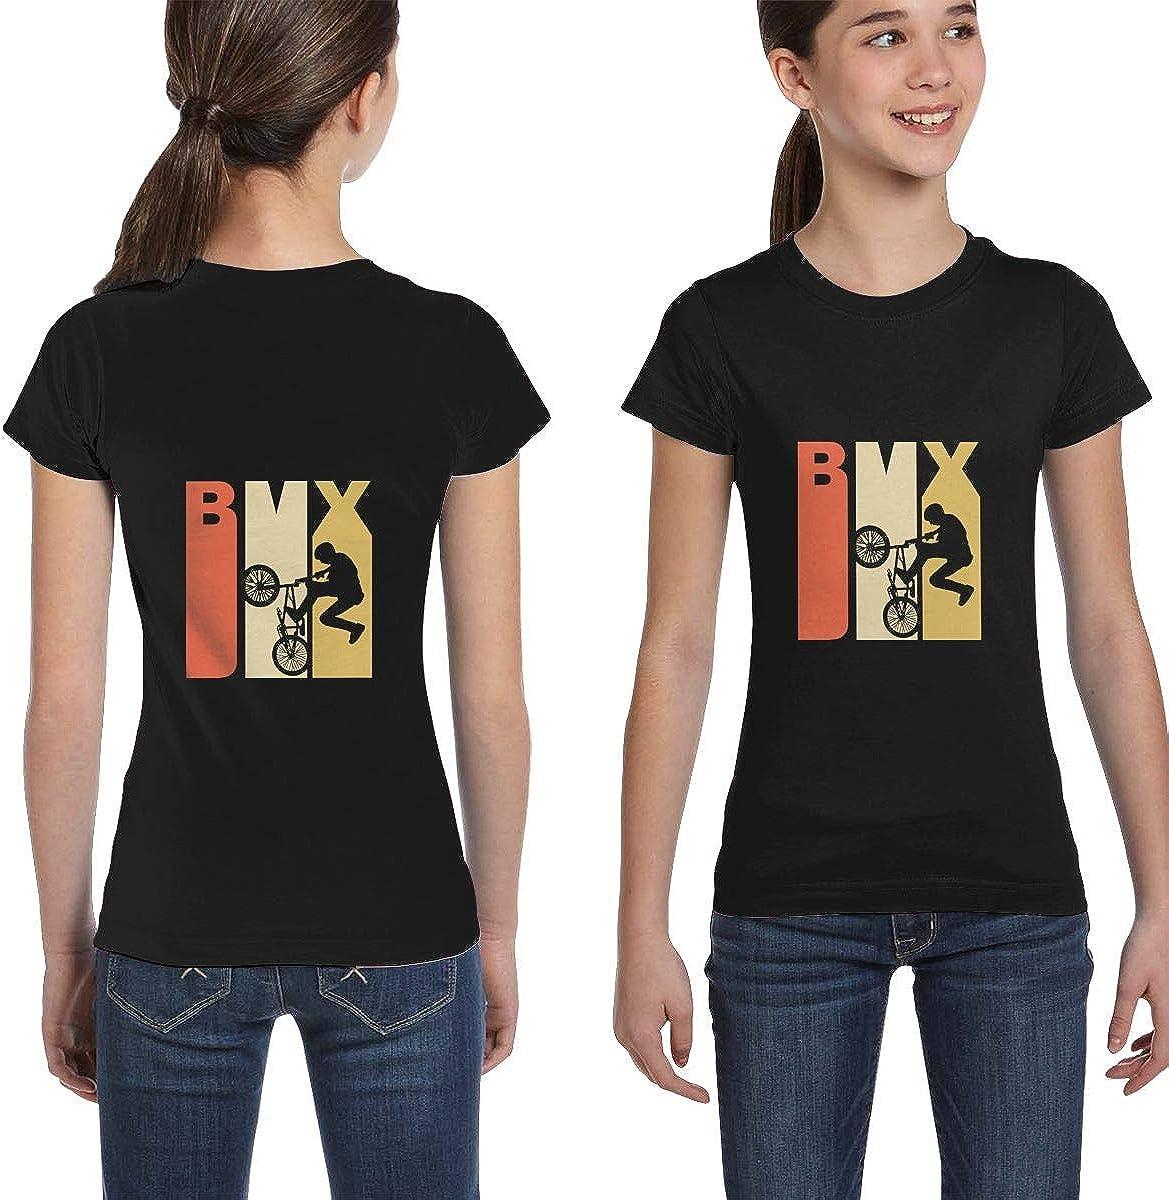 Girls Short Sleeve Retro 1970s Style BMX Silhouette Shirts XS-XL Fashion Tunic Shirt Dress